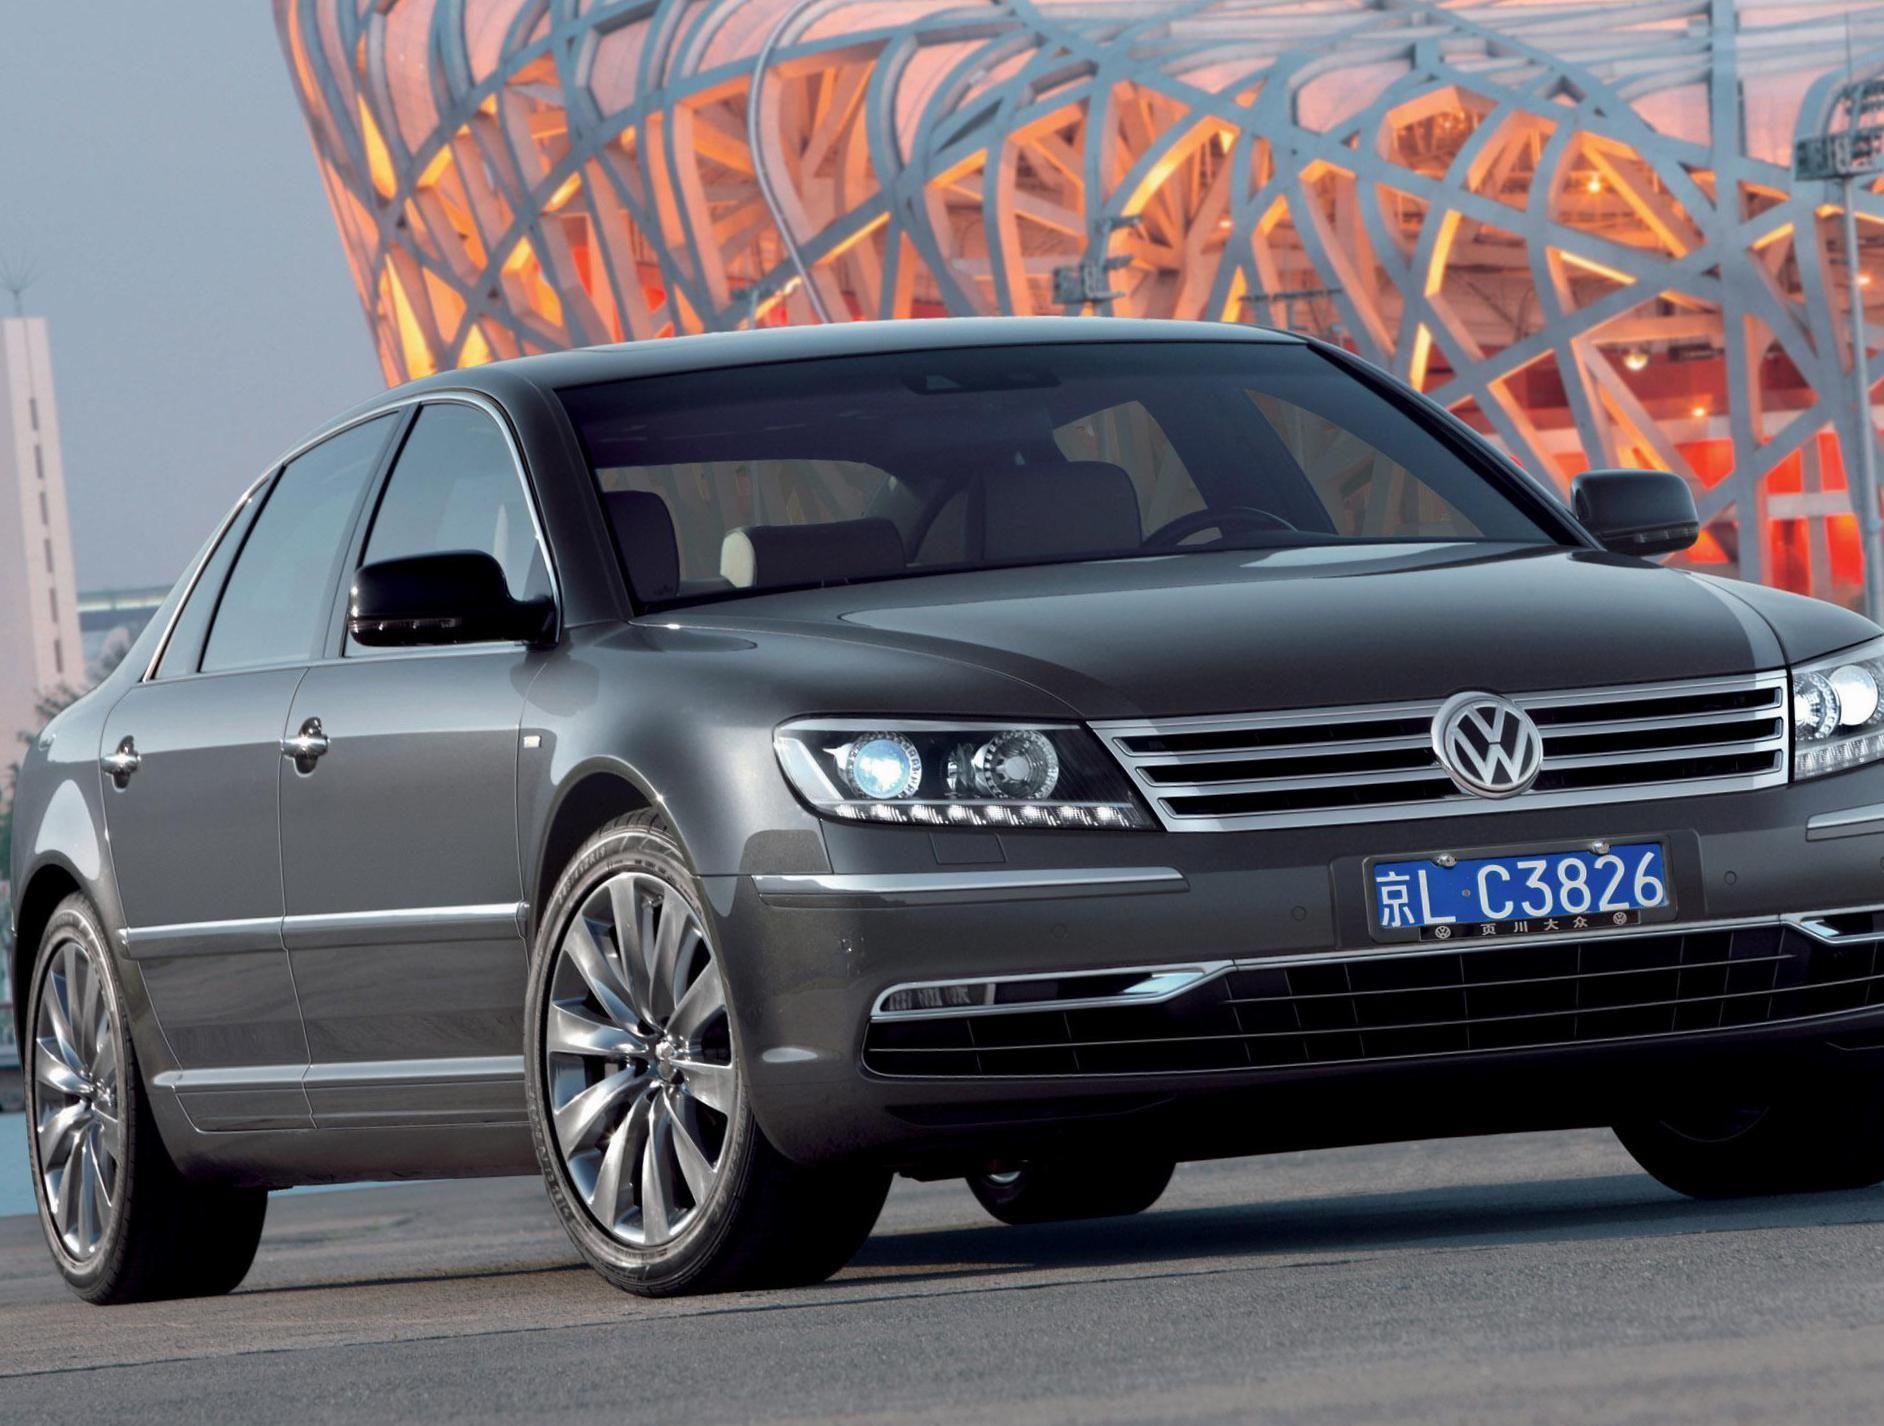 Volkswagen Phaeton used